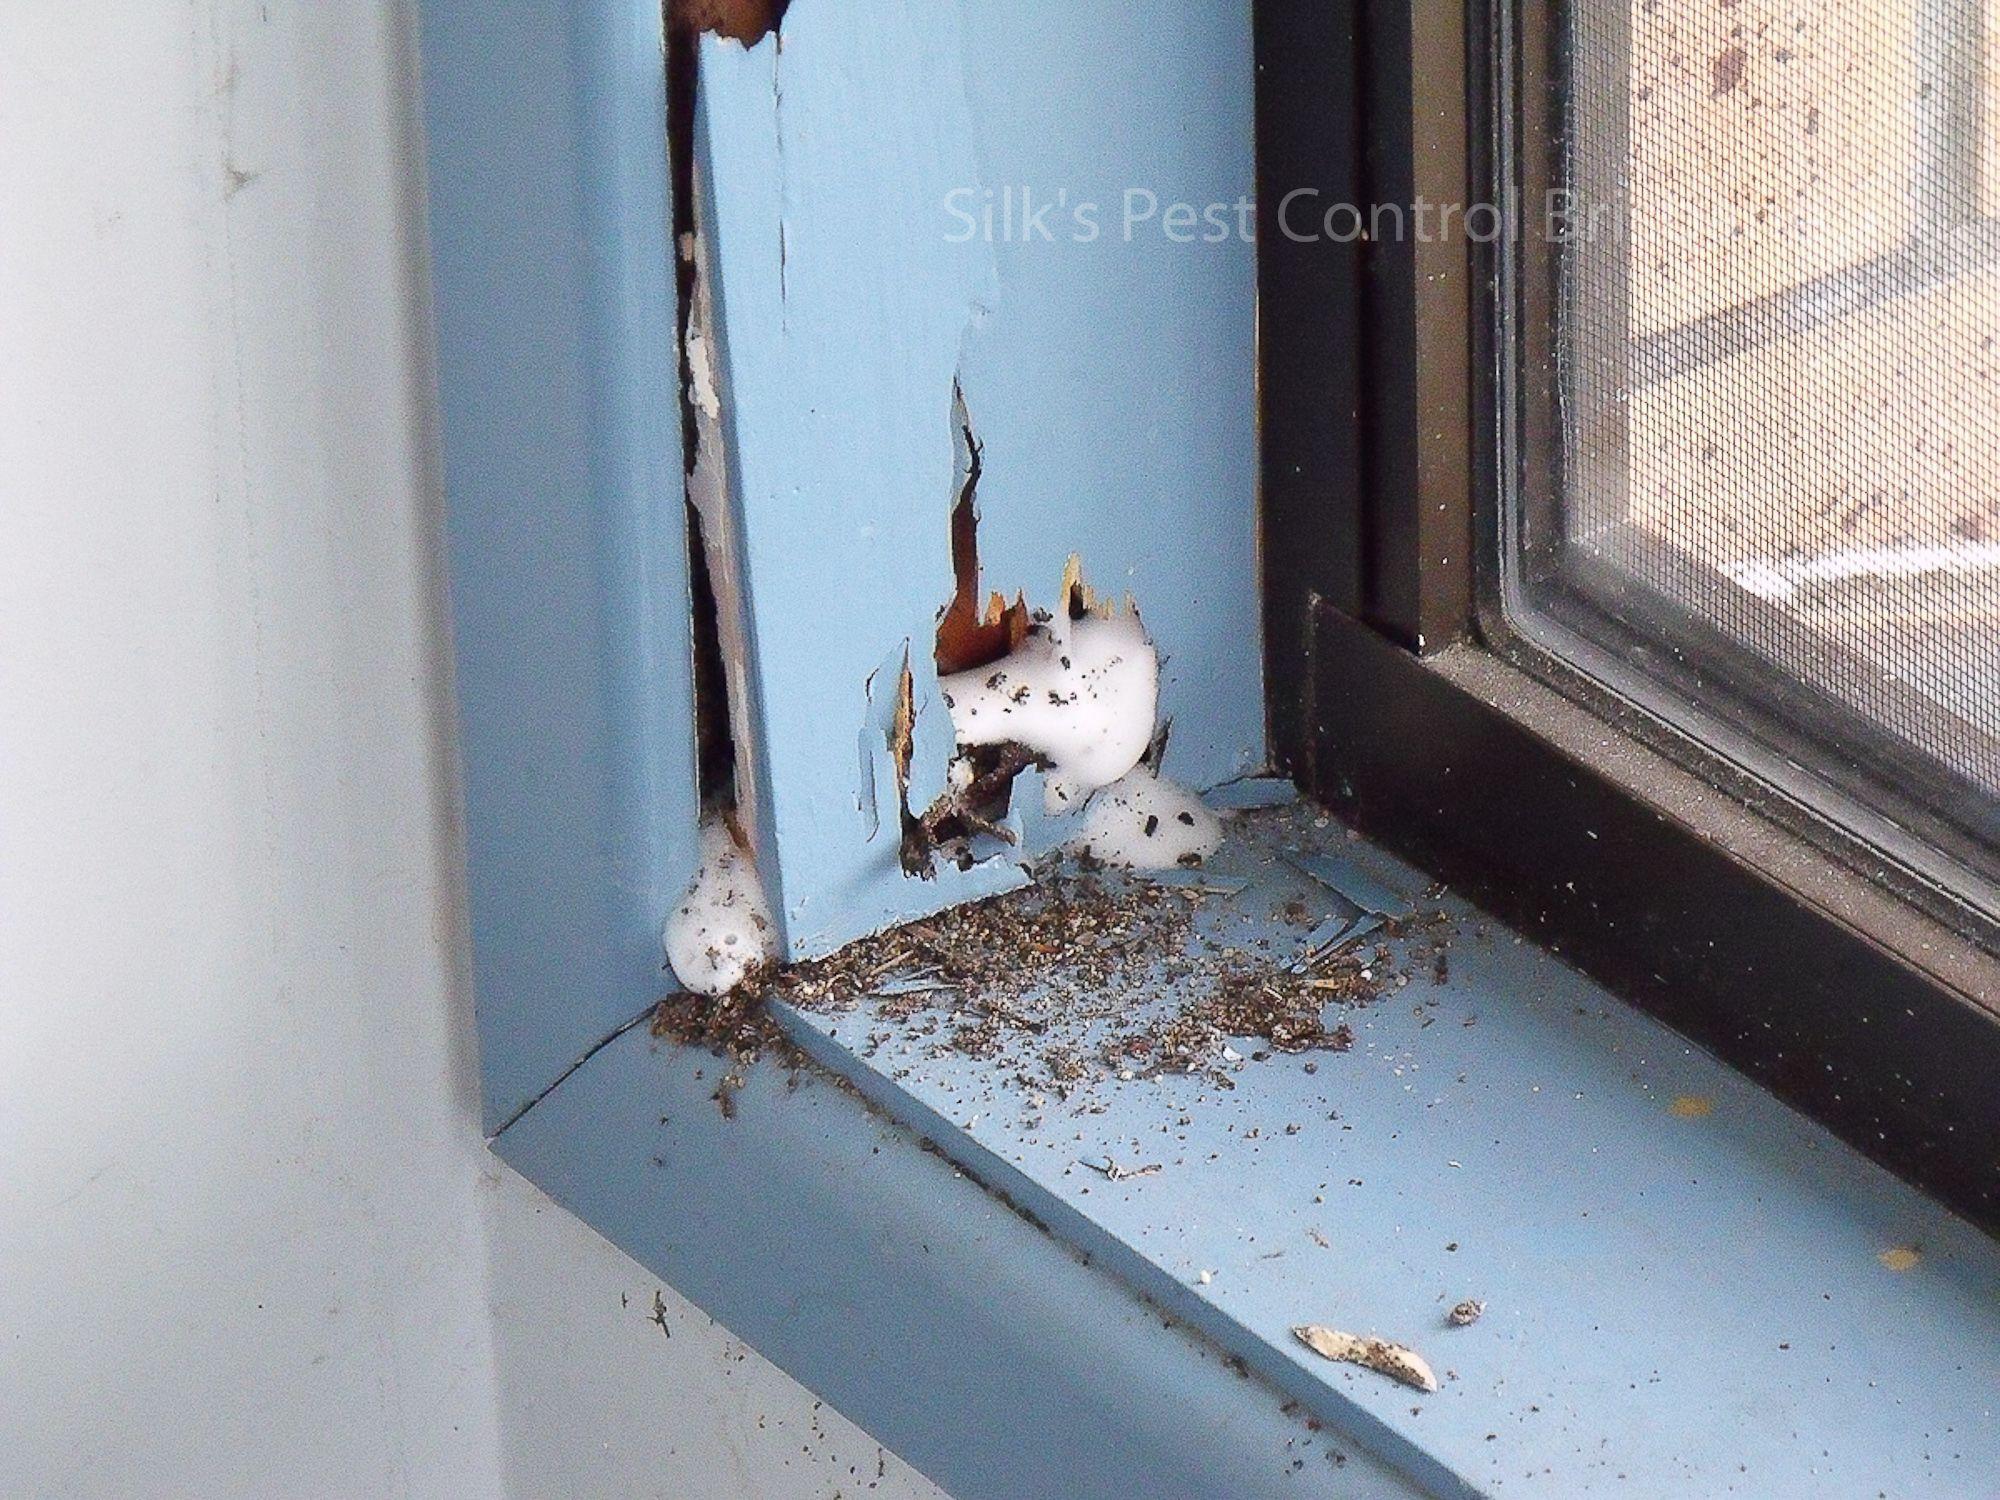 Silk S Pest Control Taringa Termite Pest Control Experts Termite Inspection Pest Inspection Termite Pest Control